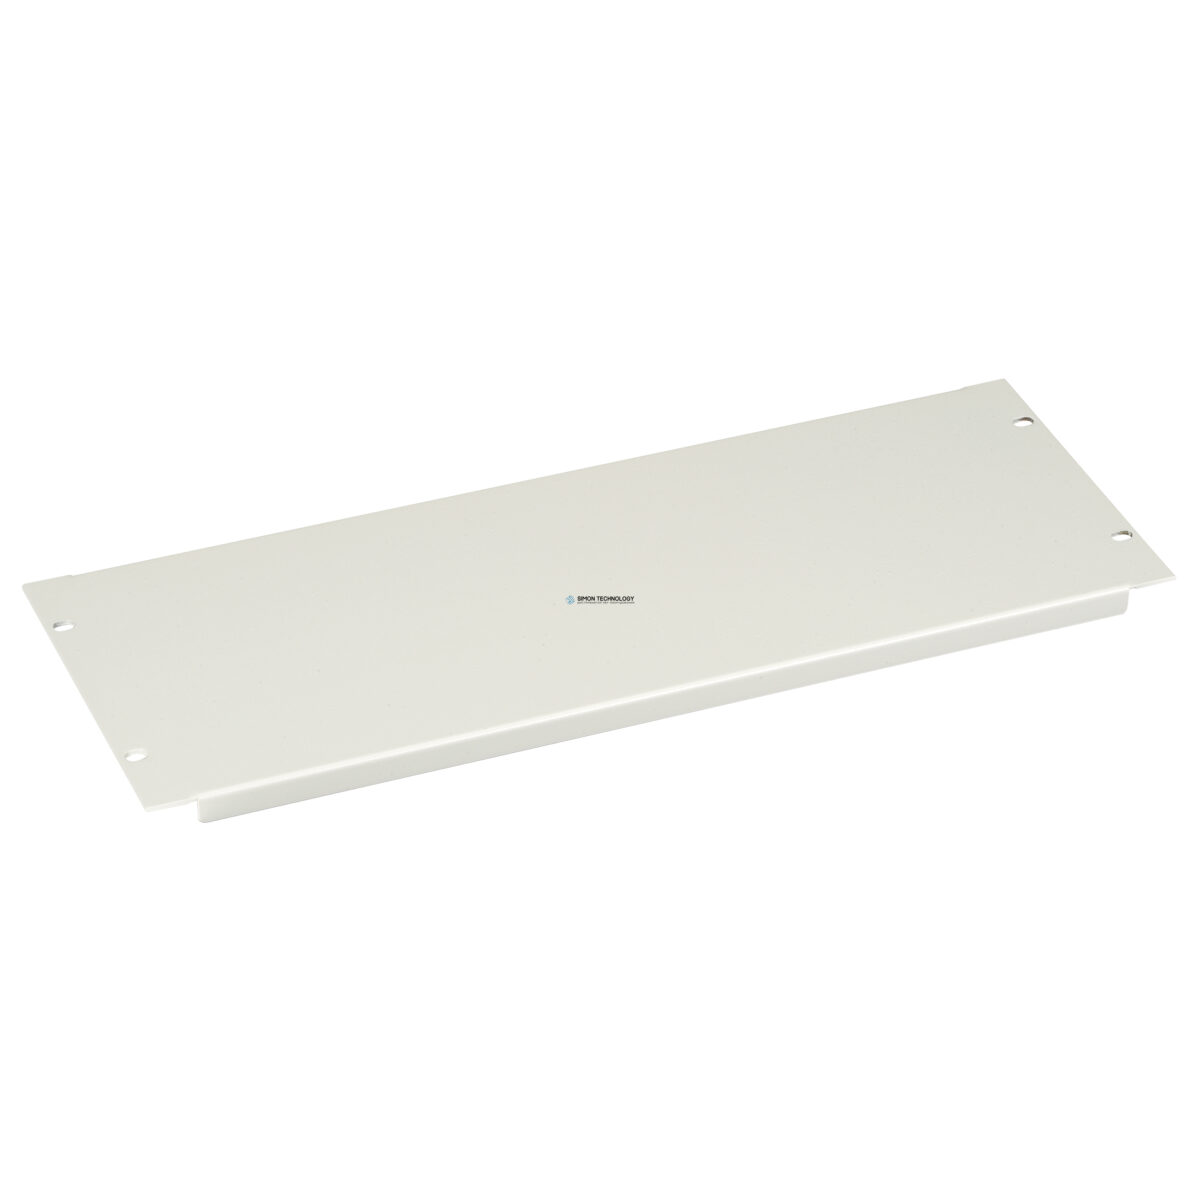 Black Box Filler Panel - Ivory 4U (RMTW04)